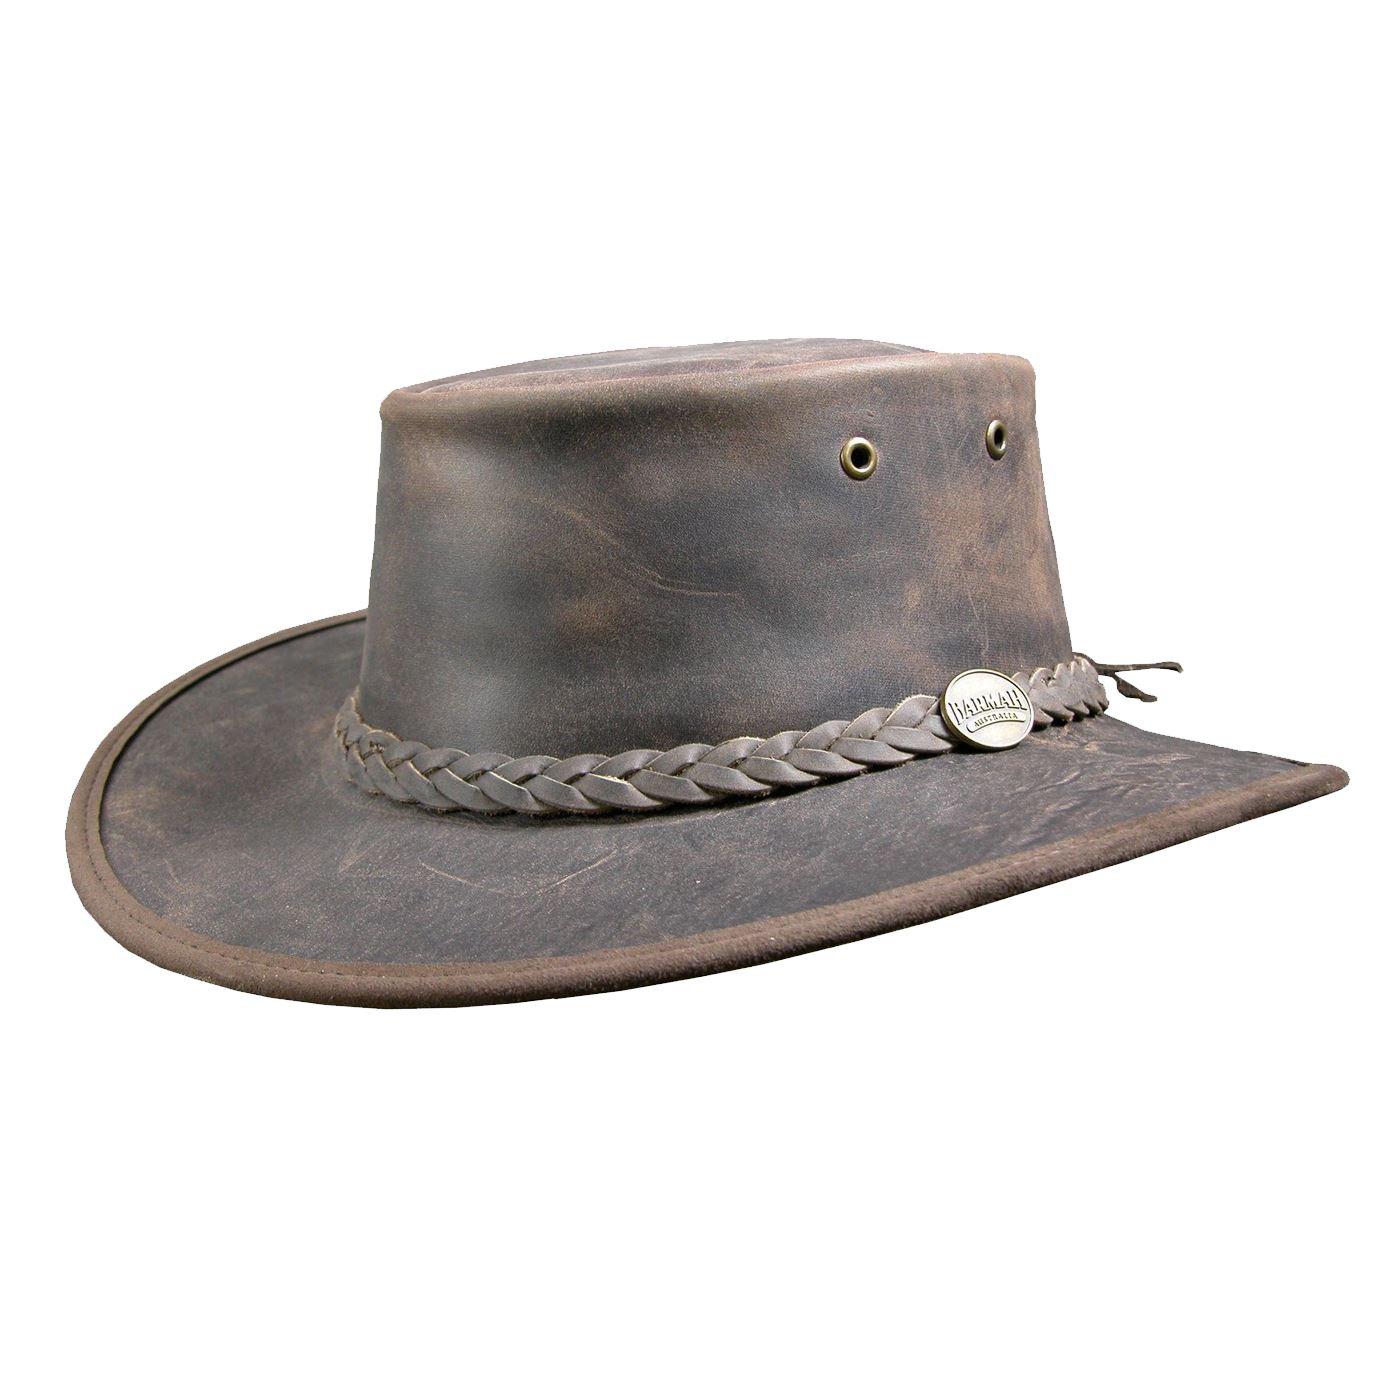 094b527e2fc6b Barmah Foldaway Bronco Brown Leather Waterproof Bush Hat Australia Gents  Ladies